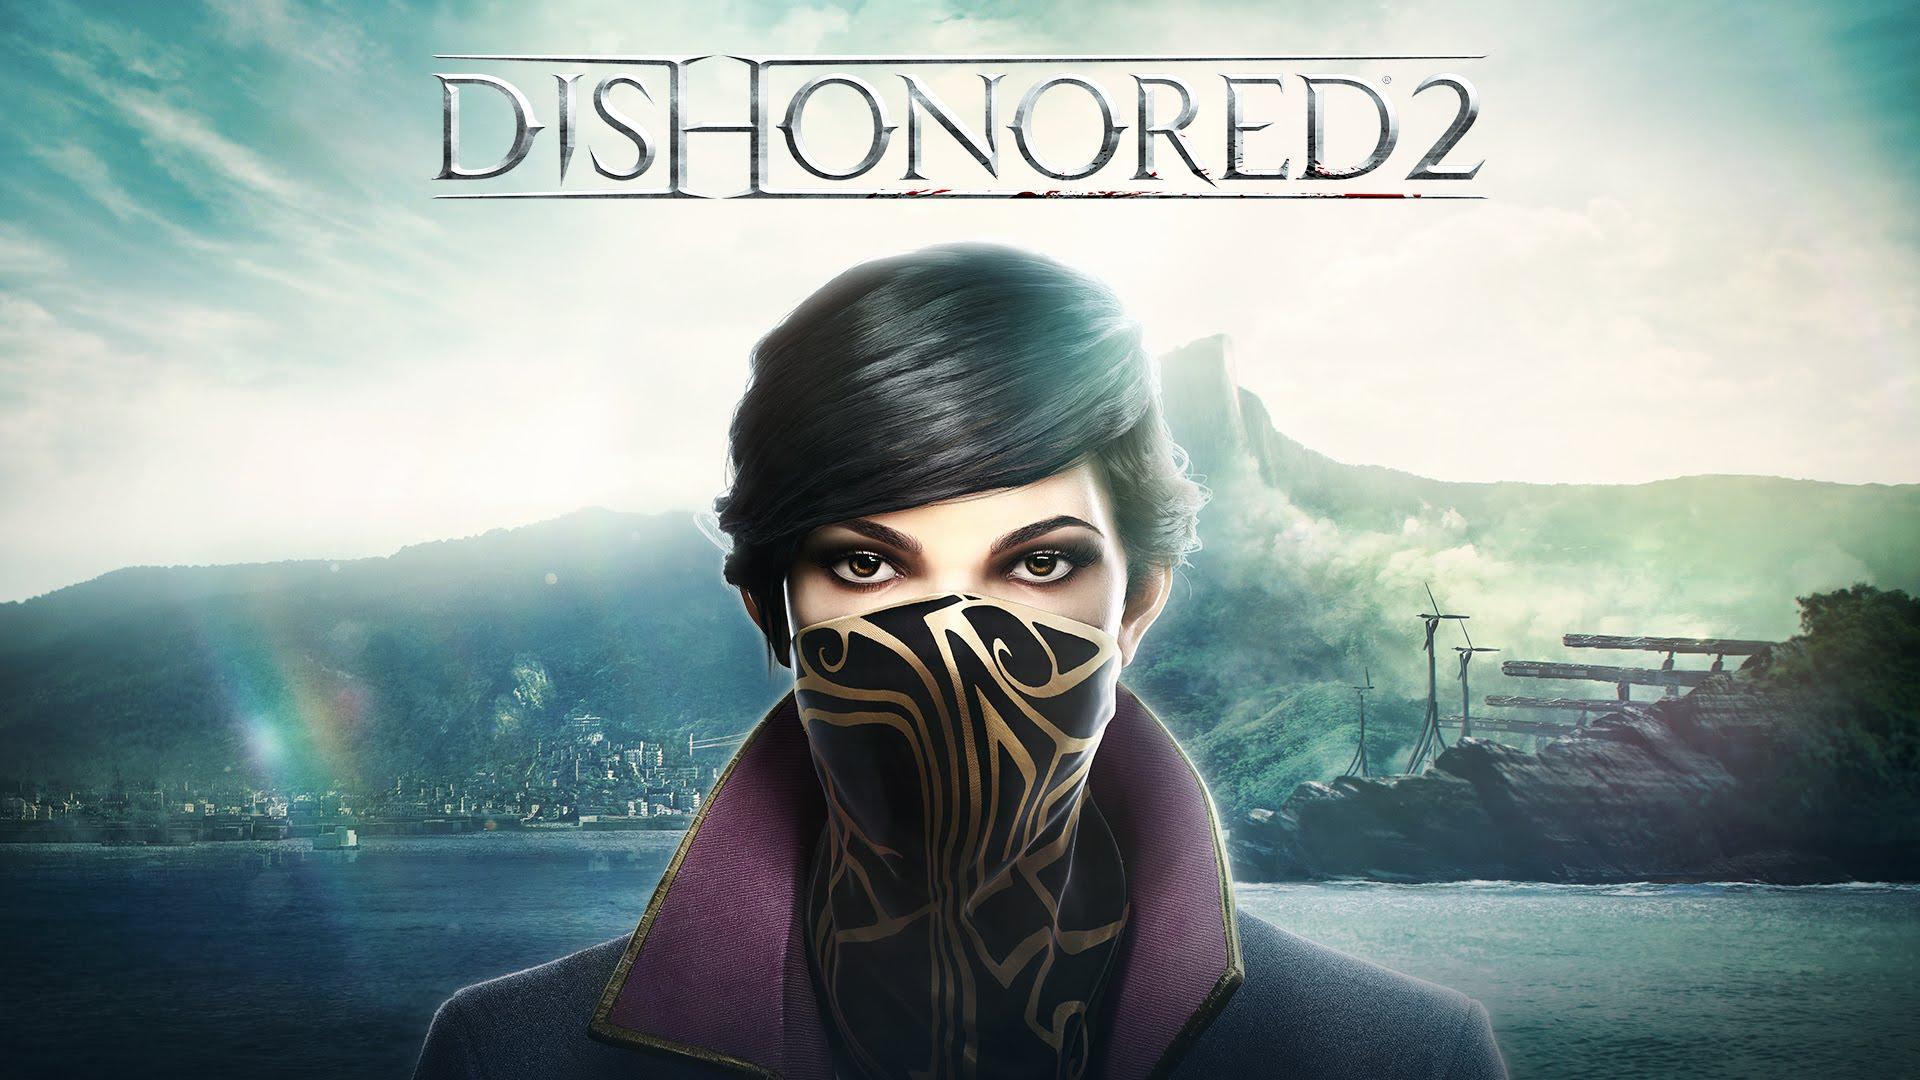 Первые оценки Dishonored 2 не прежде релиза